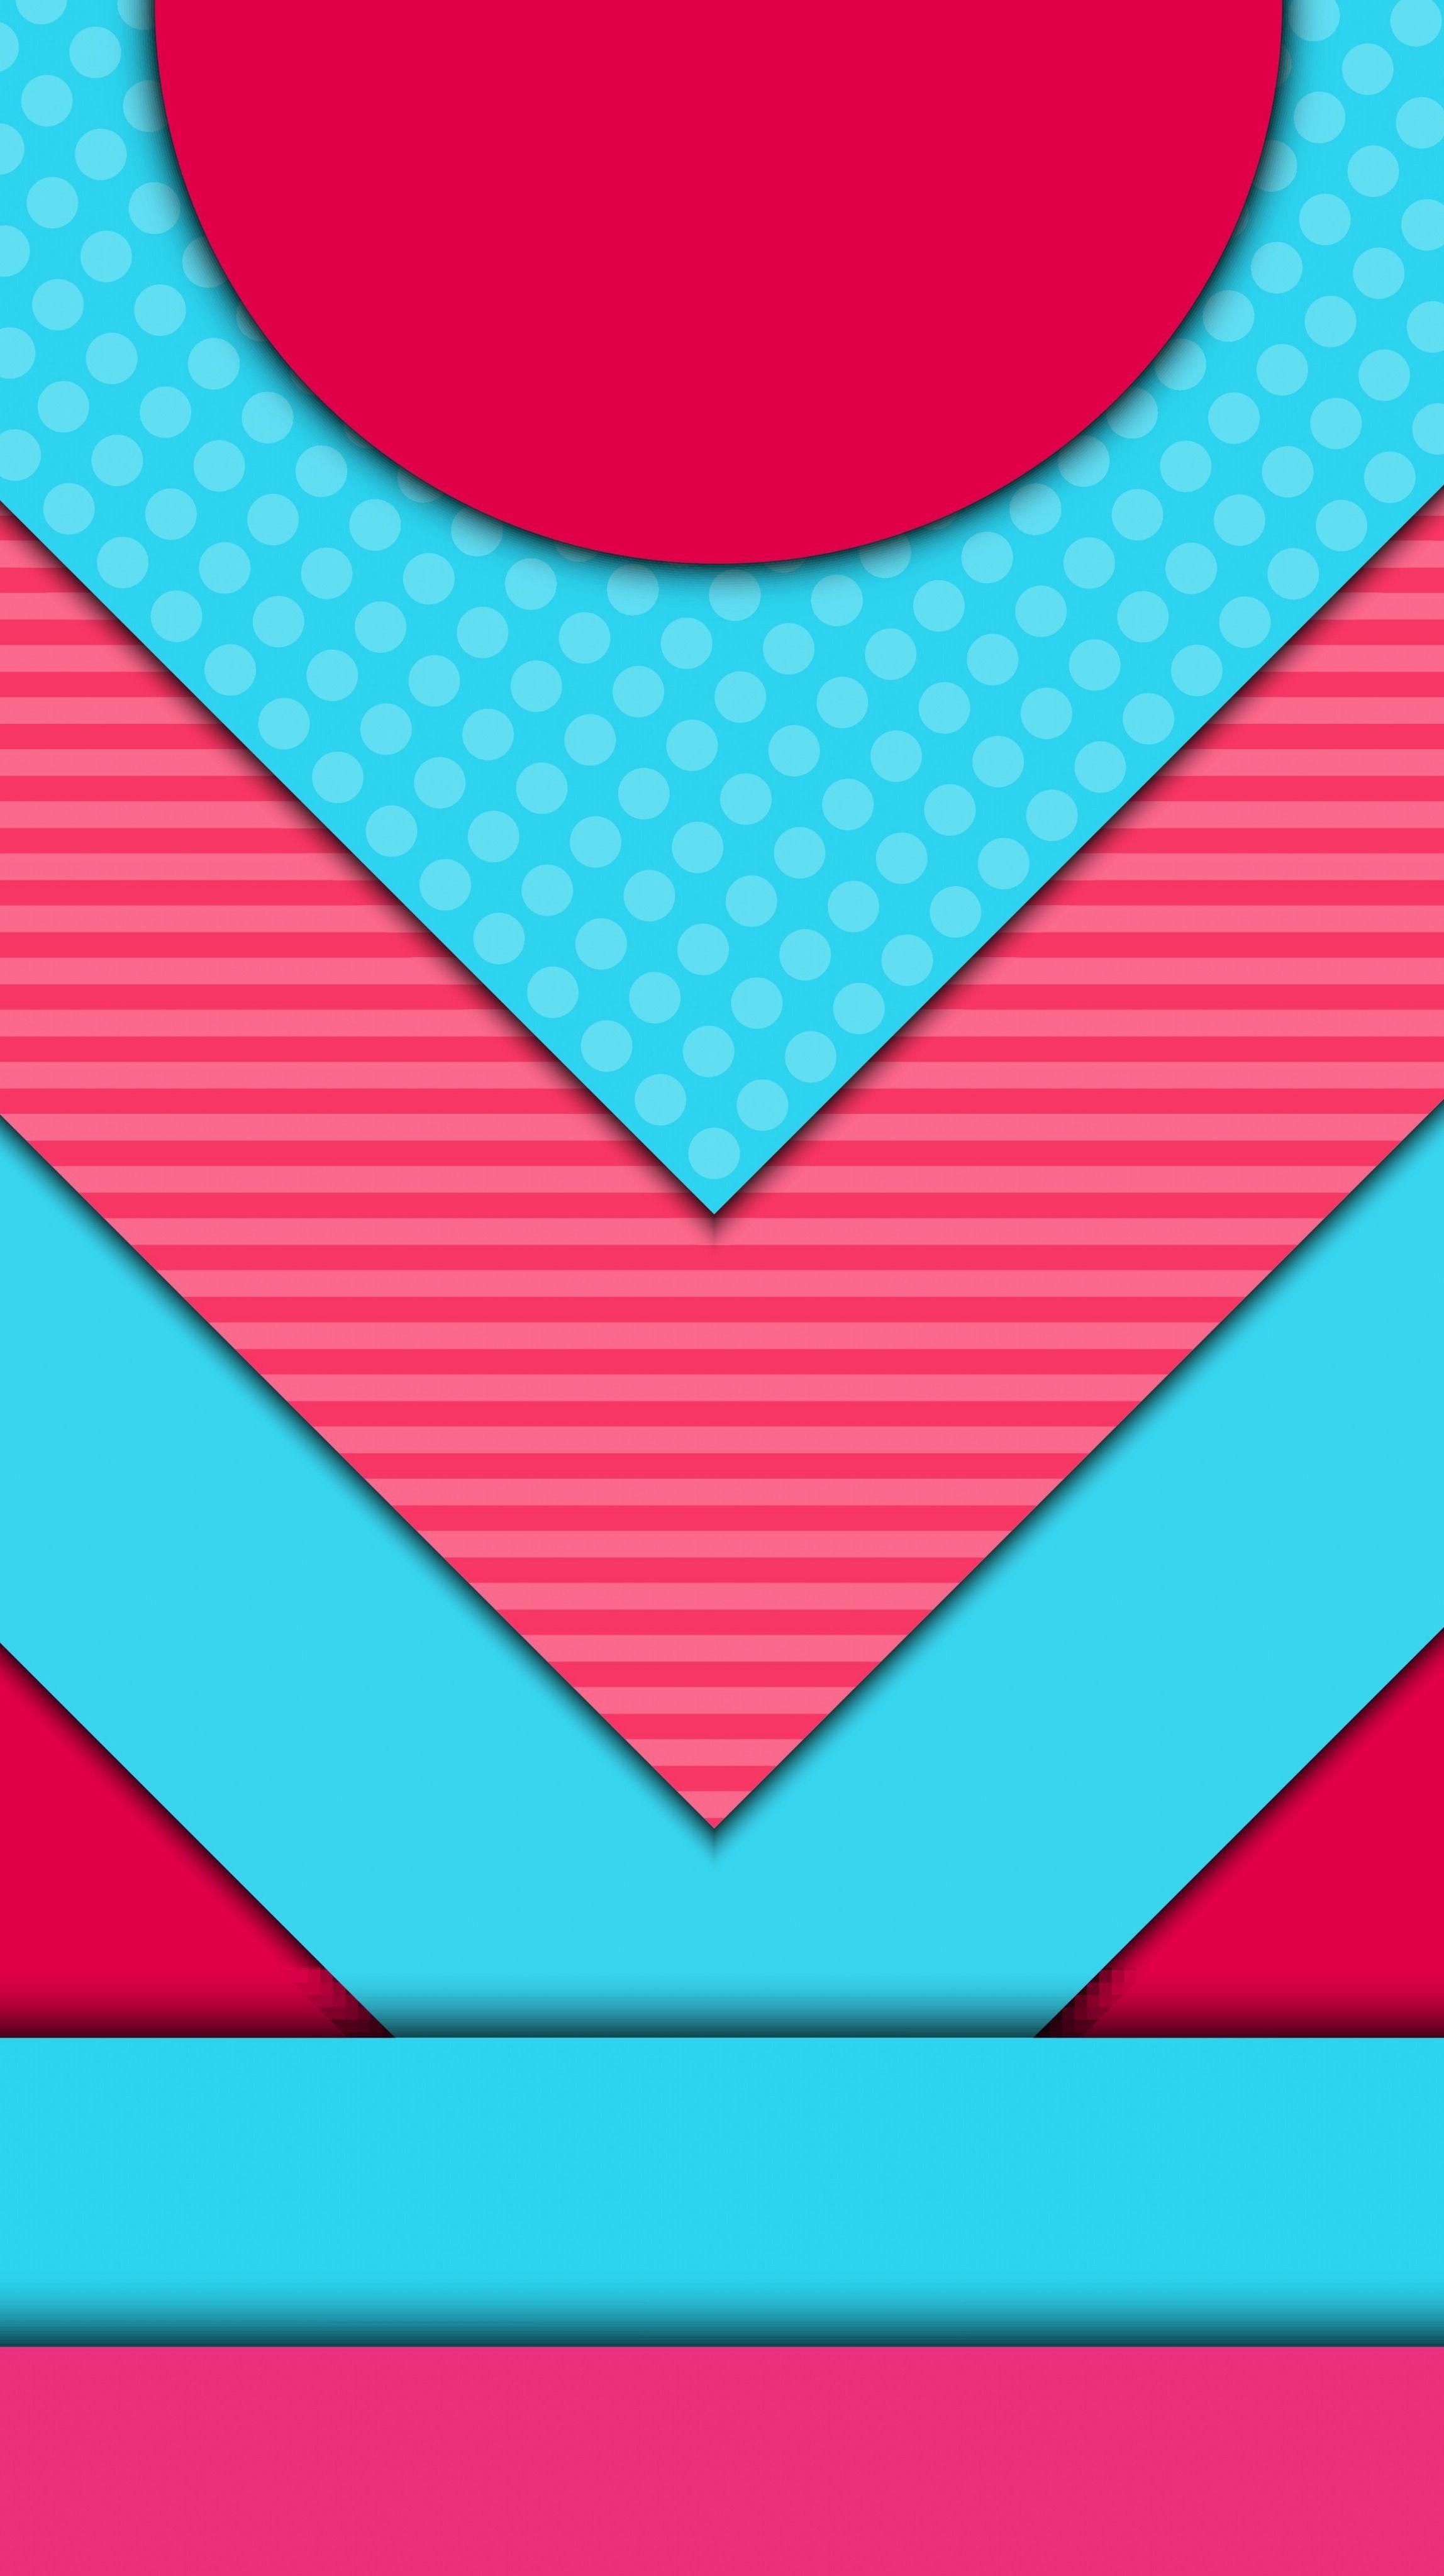 Pink And Aqua Geometric Abstract Wallpaper